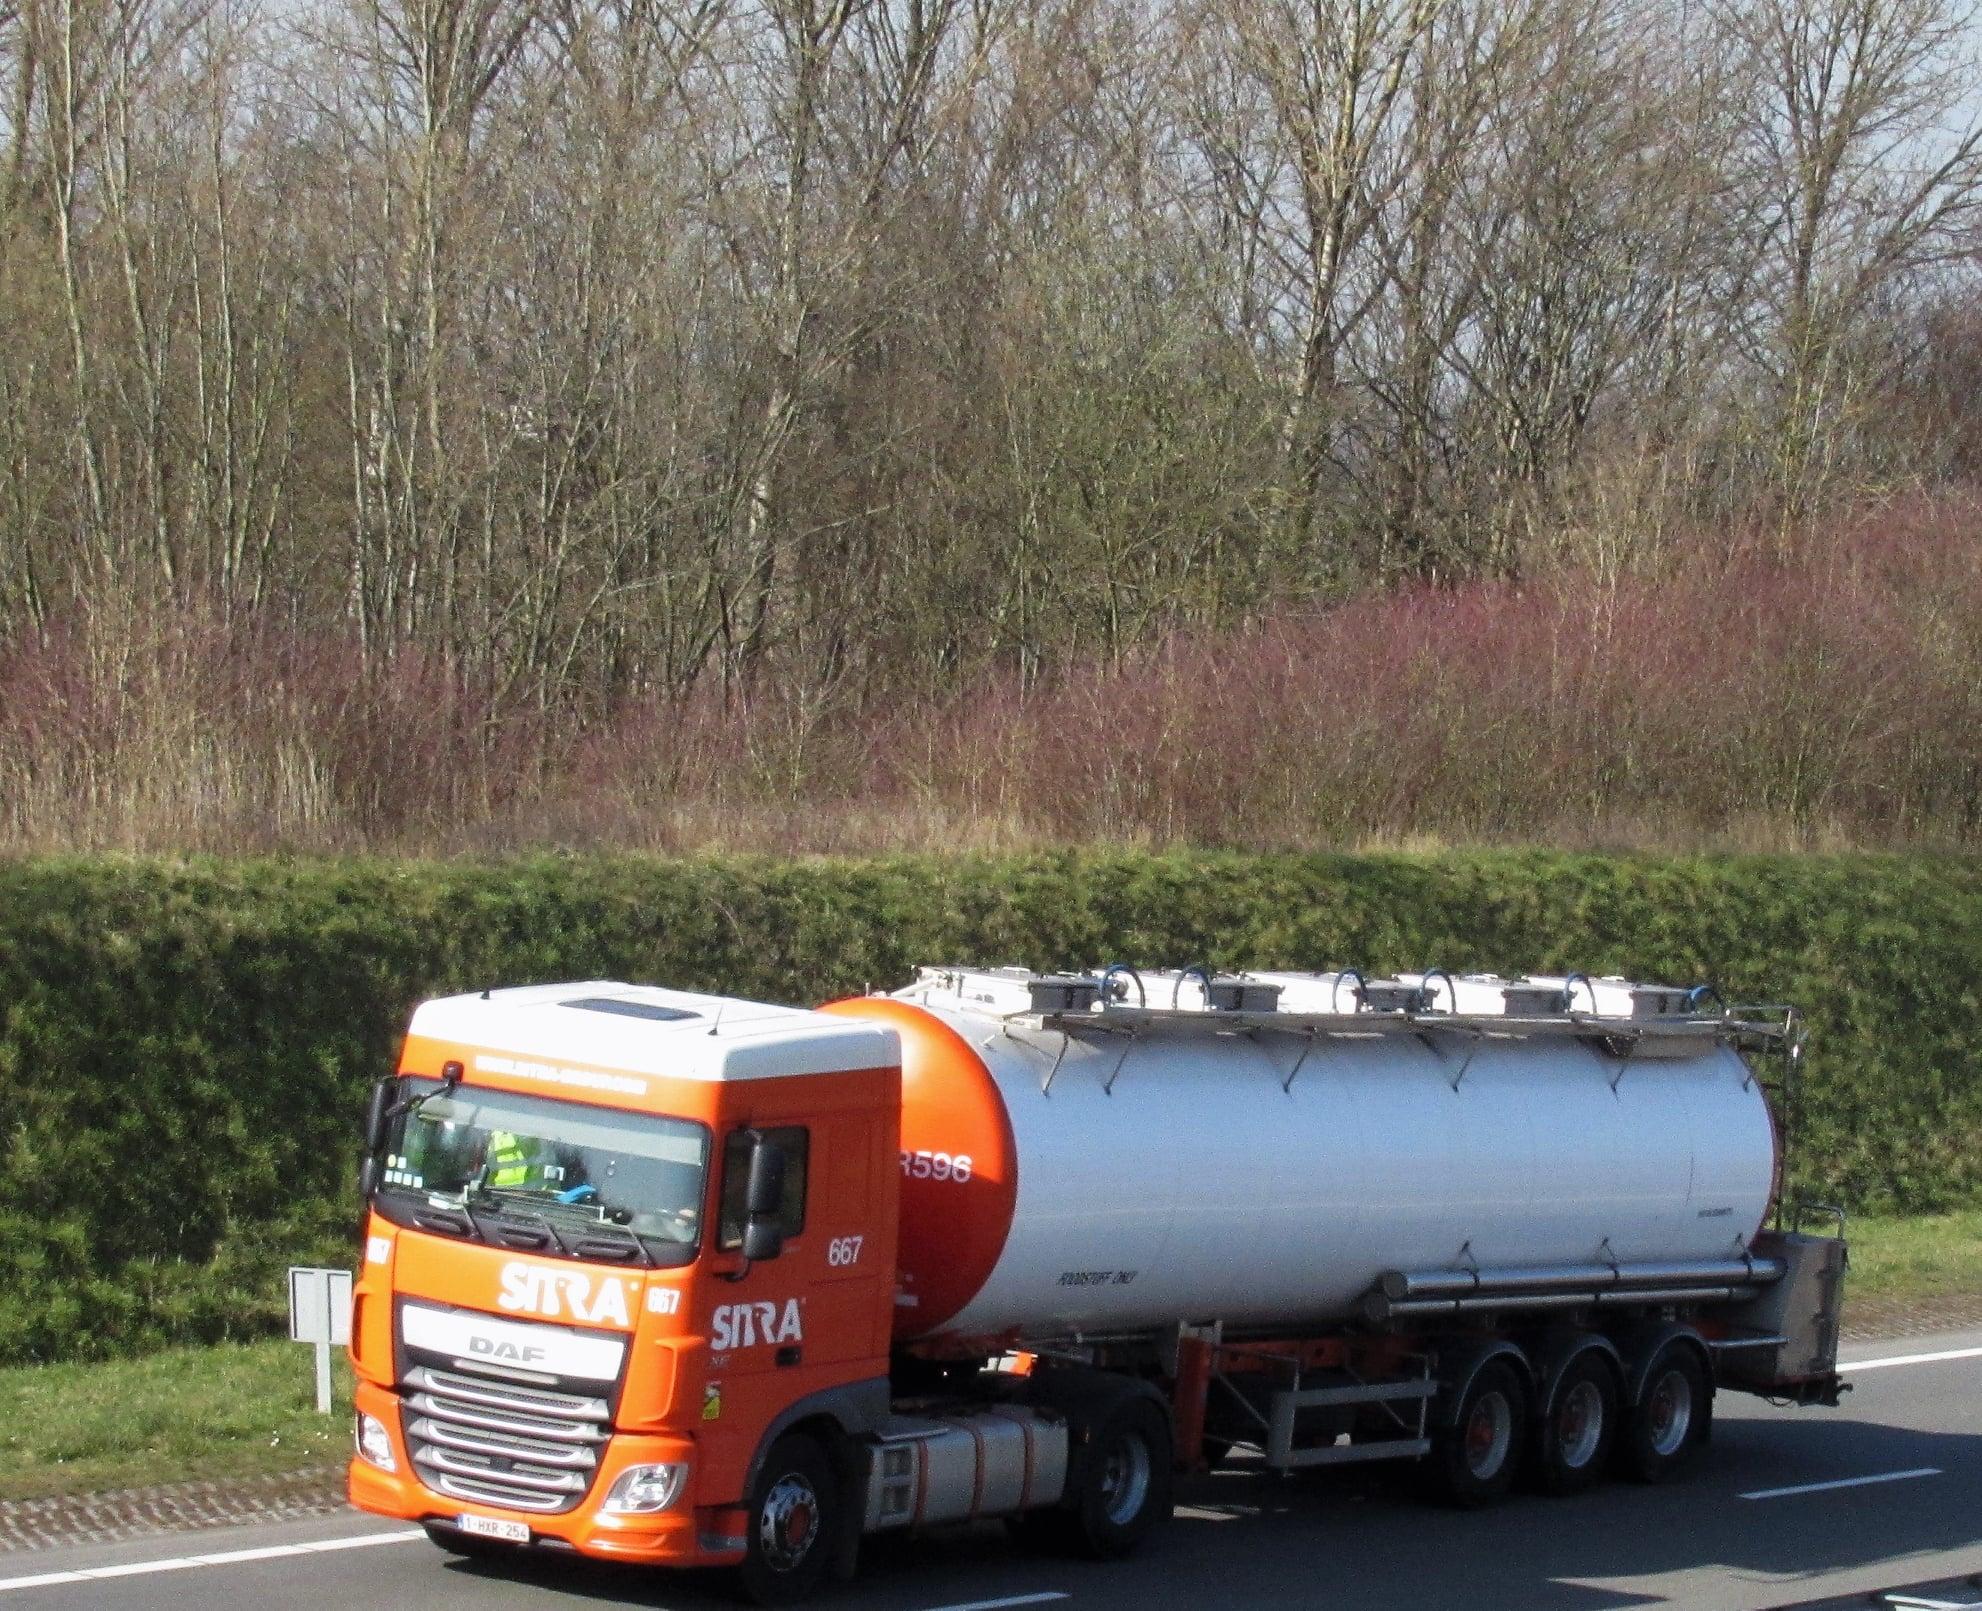 Willem-A-de-Jonge-foto-N62-west-maart-2021